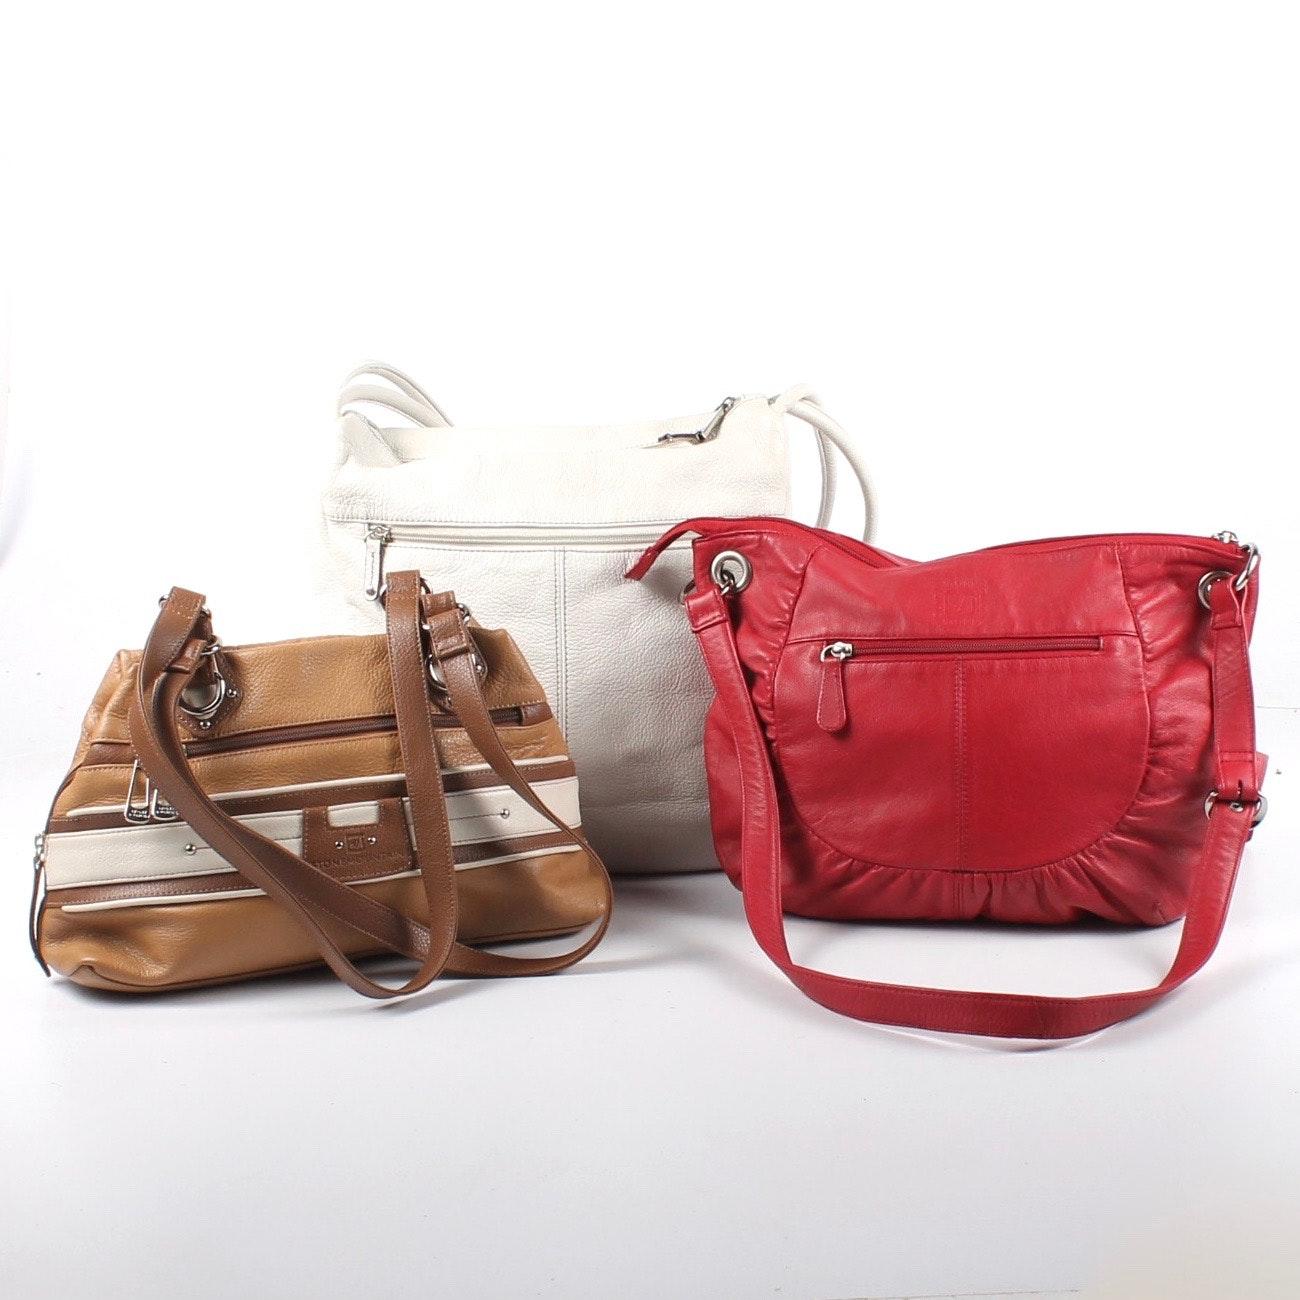 Genuine Leather Handbag Collection